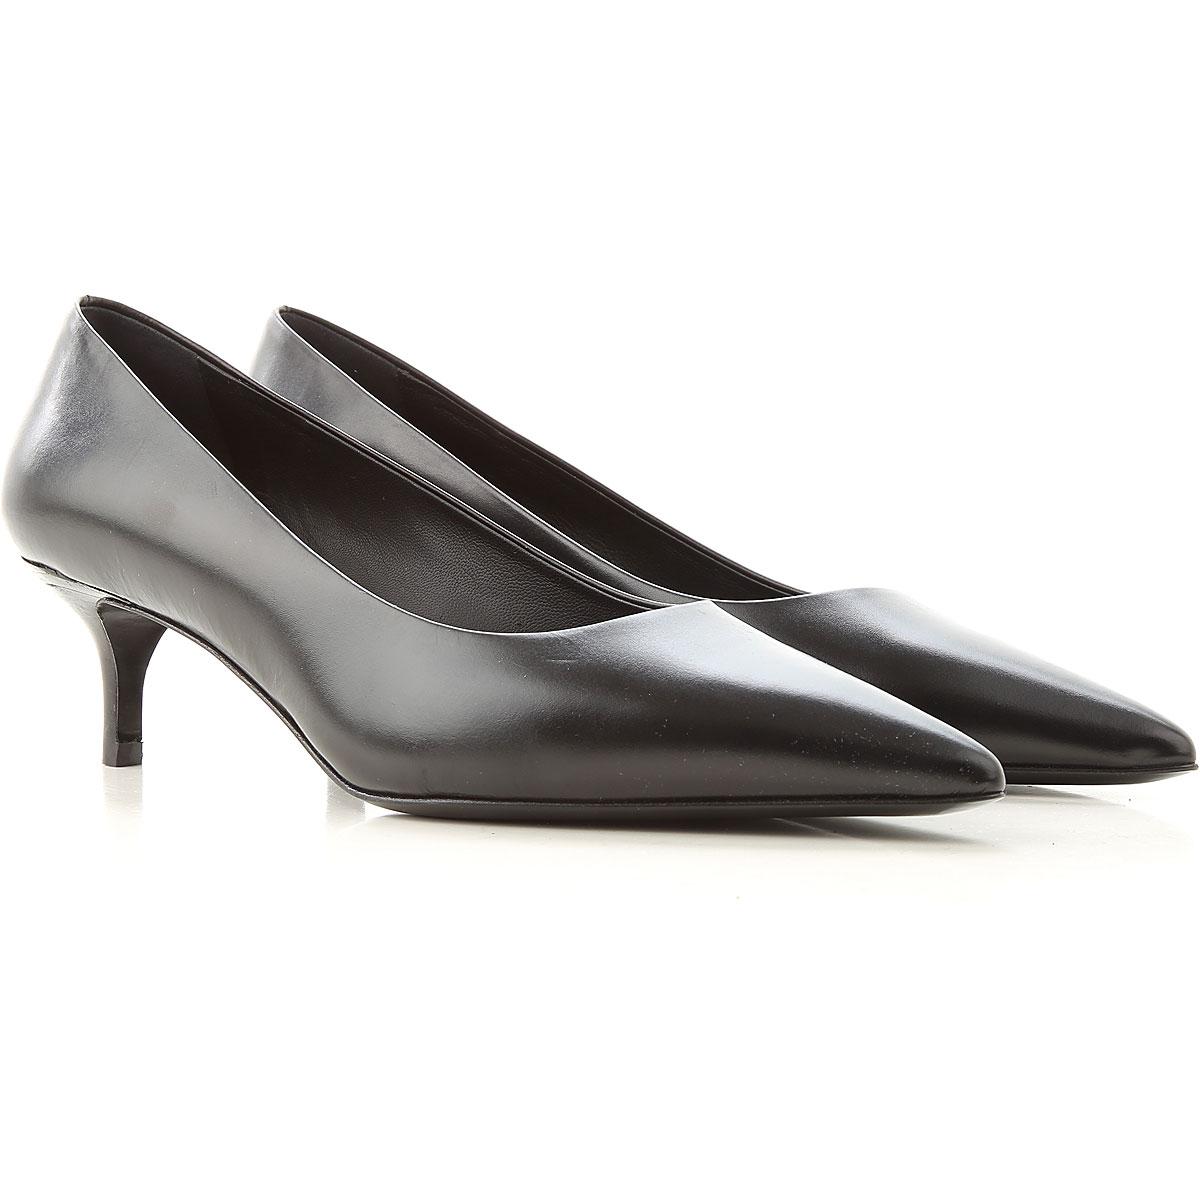 Lella Baldi Pumps & High Heels for Women On Sale, Black, Leather, 2019, 10 6 7 8 9